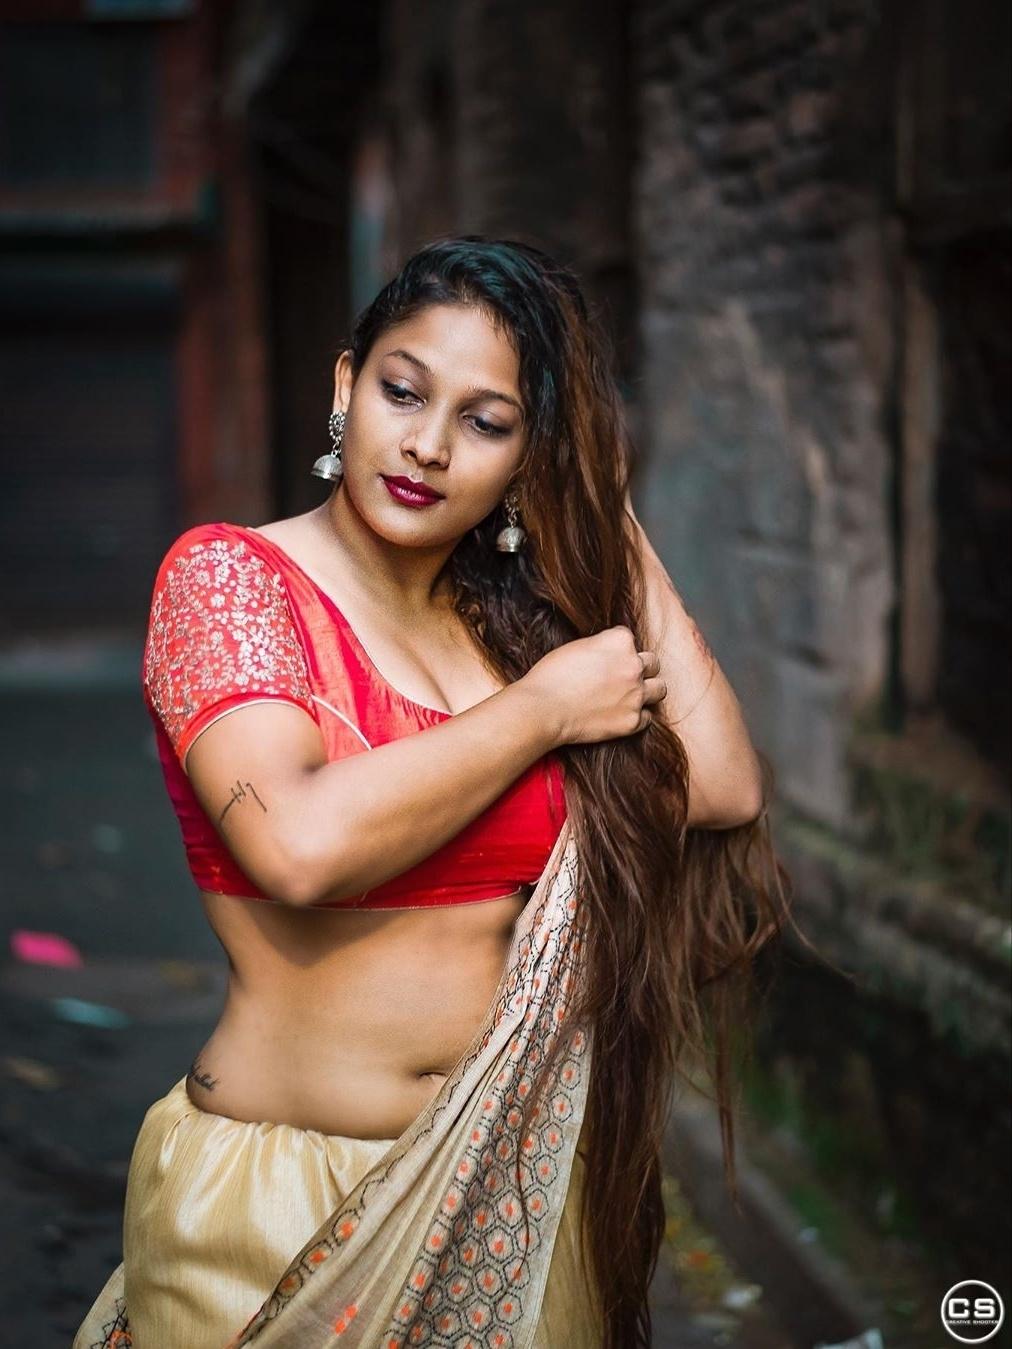 Sexy bengali yrs girl